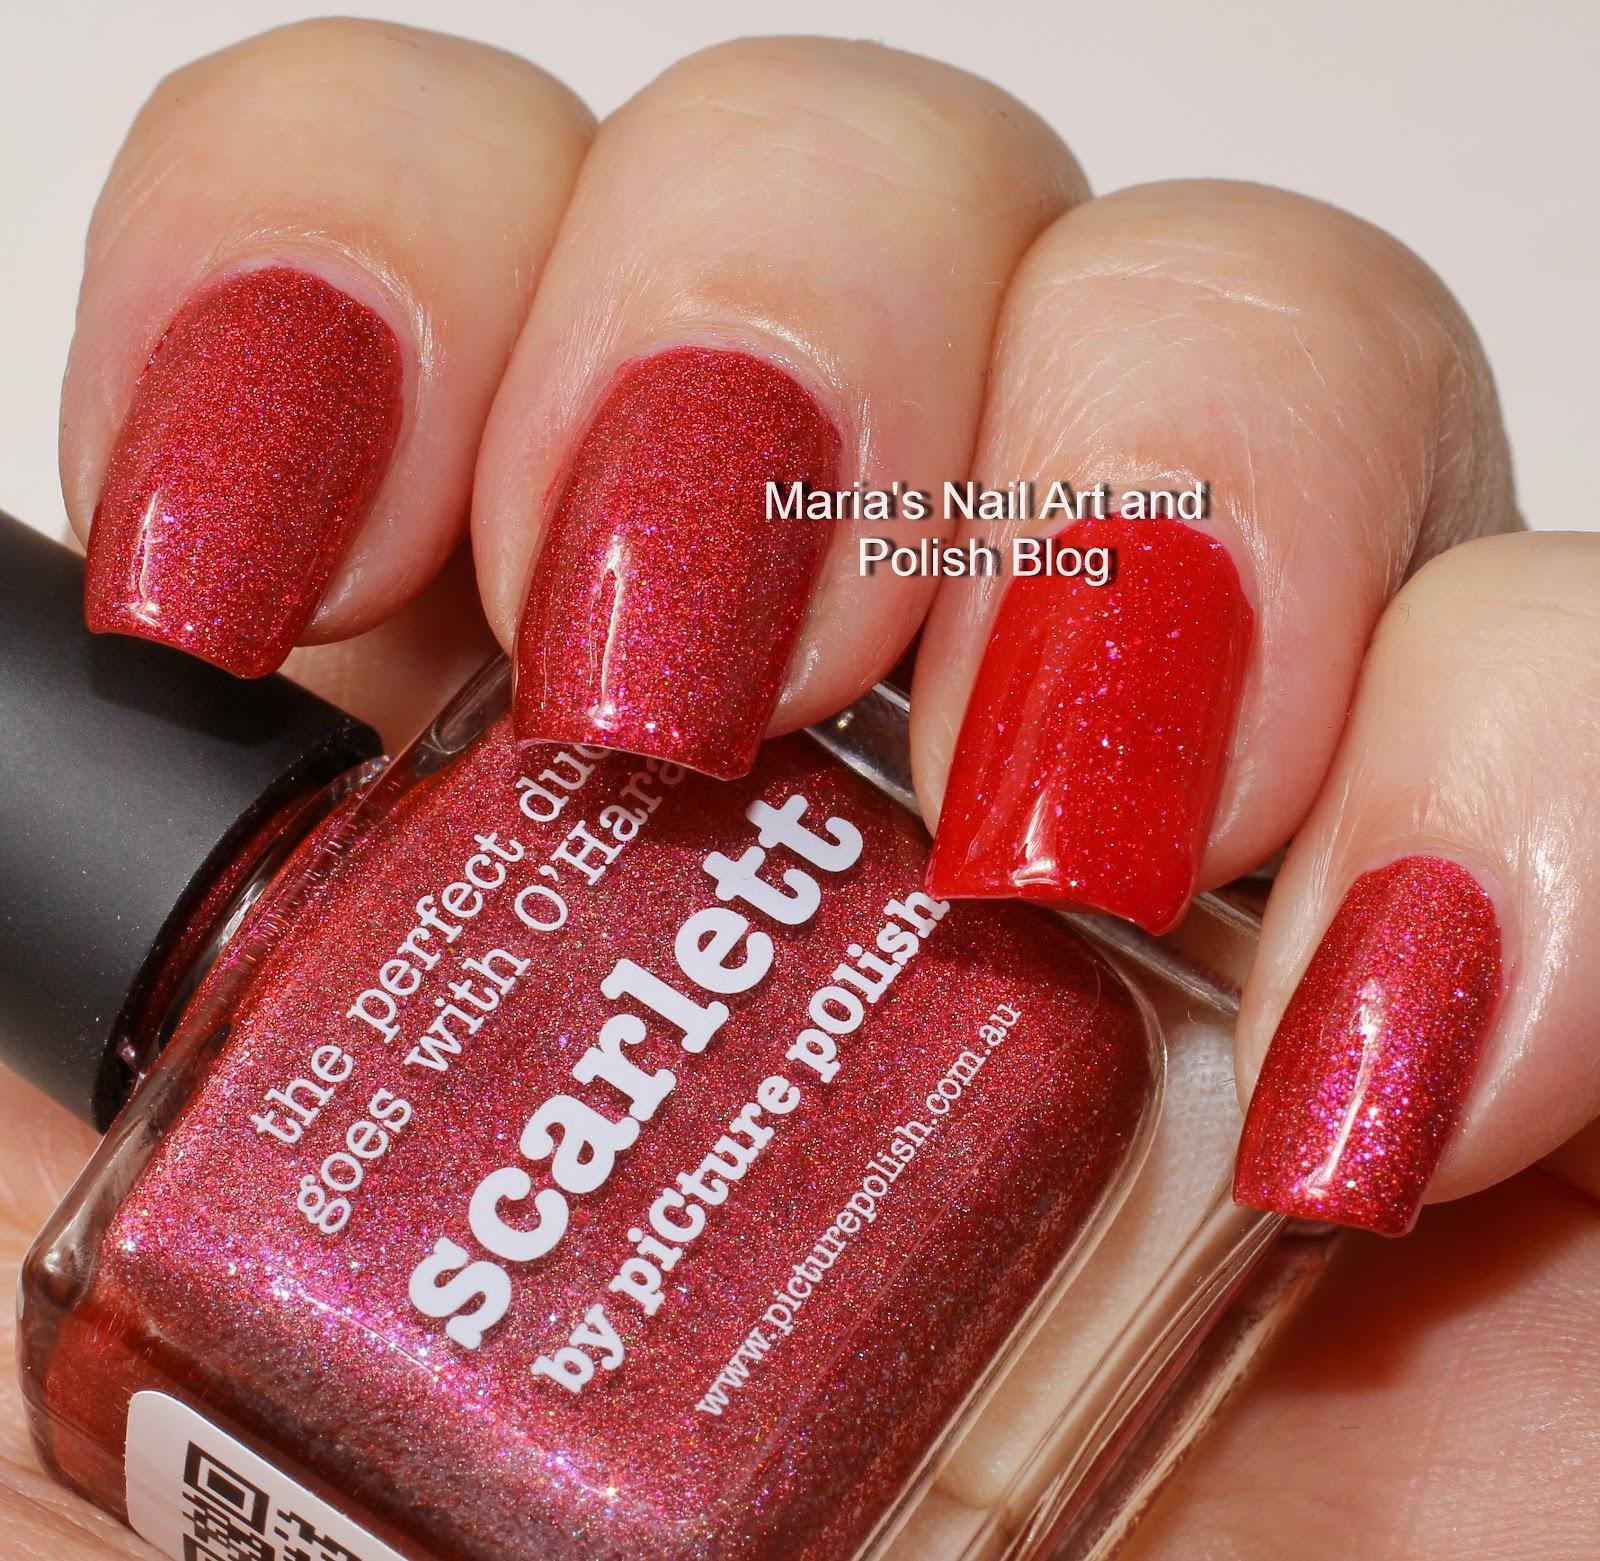 Marias Nail Art And Polish Blog: Picture Polish Scarlett